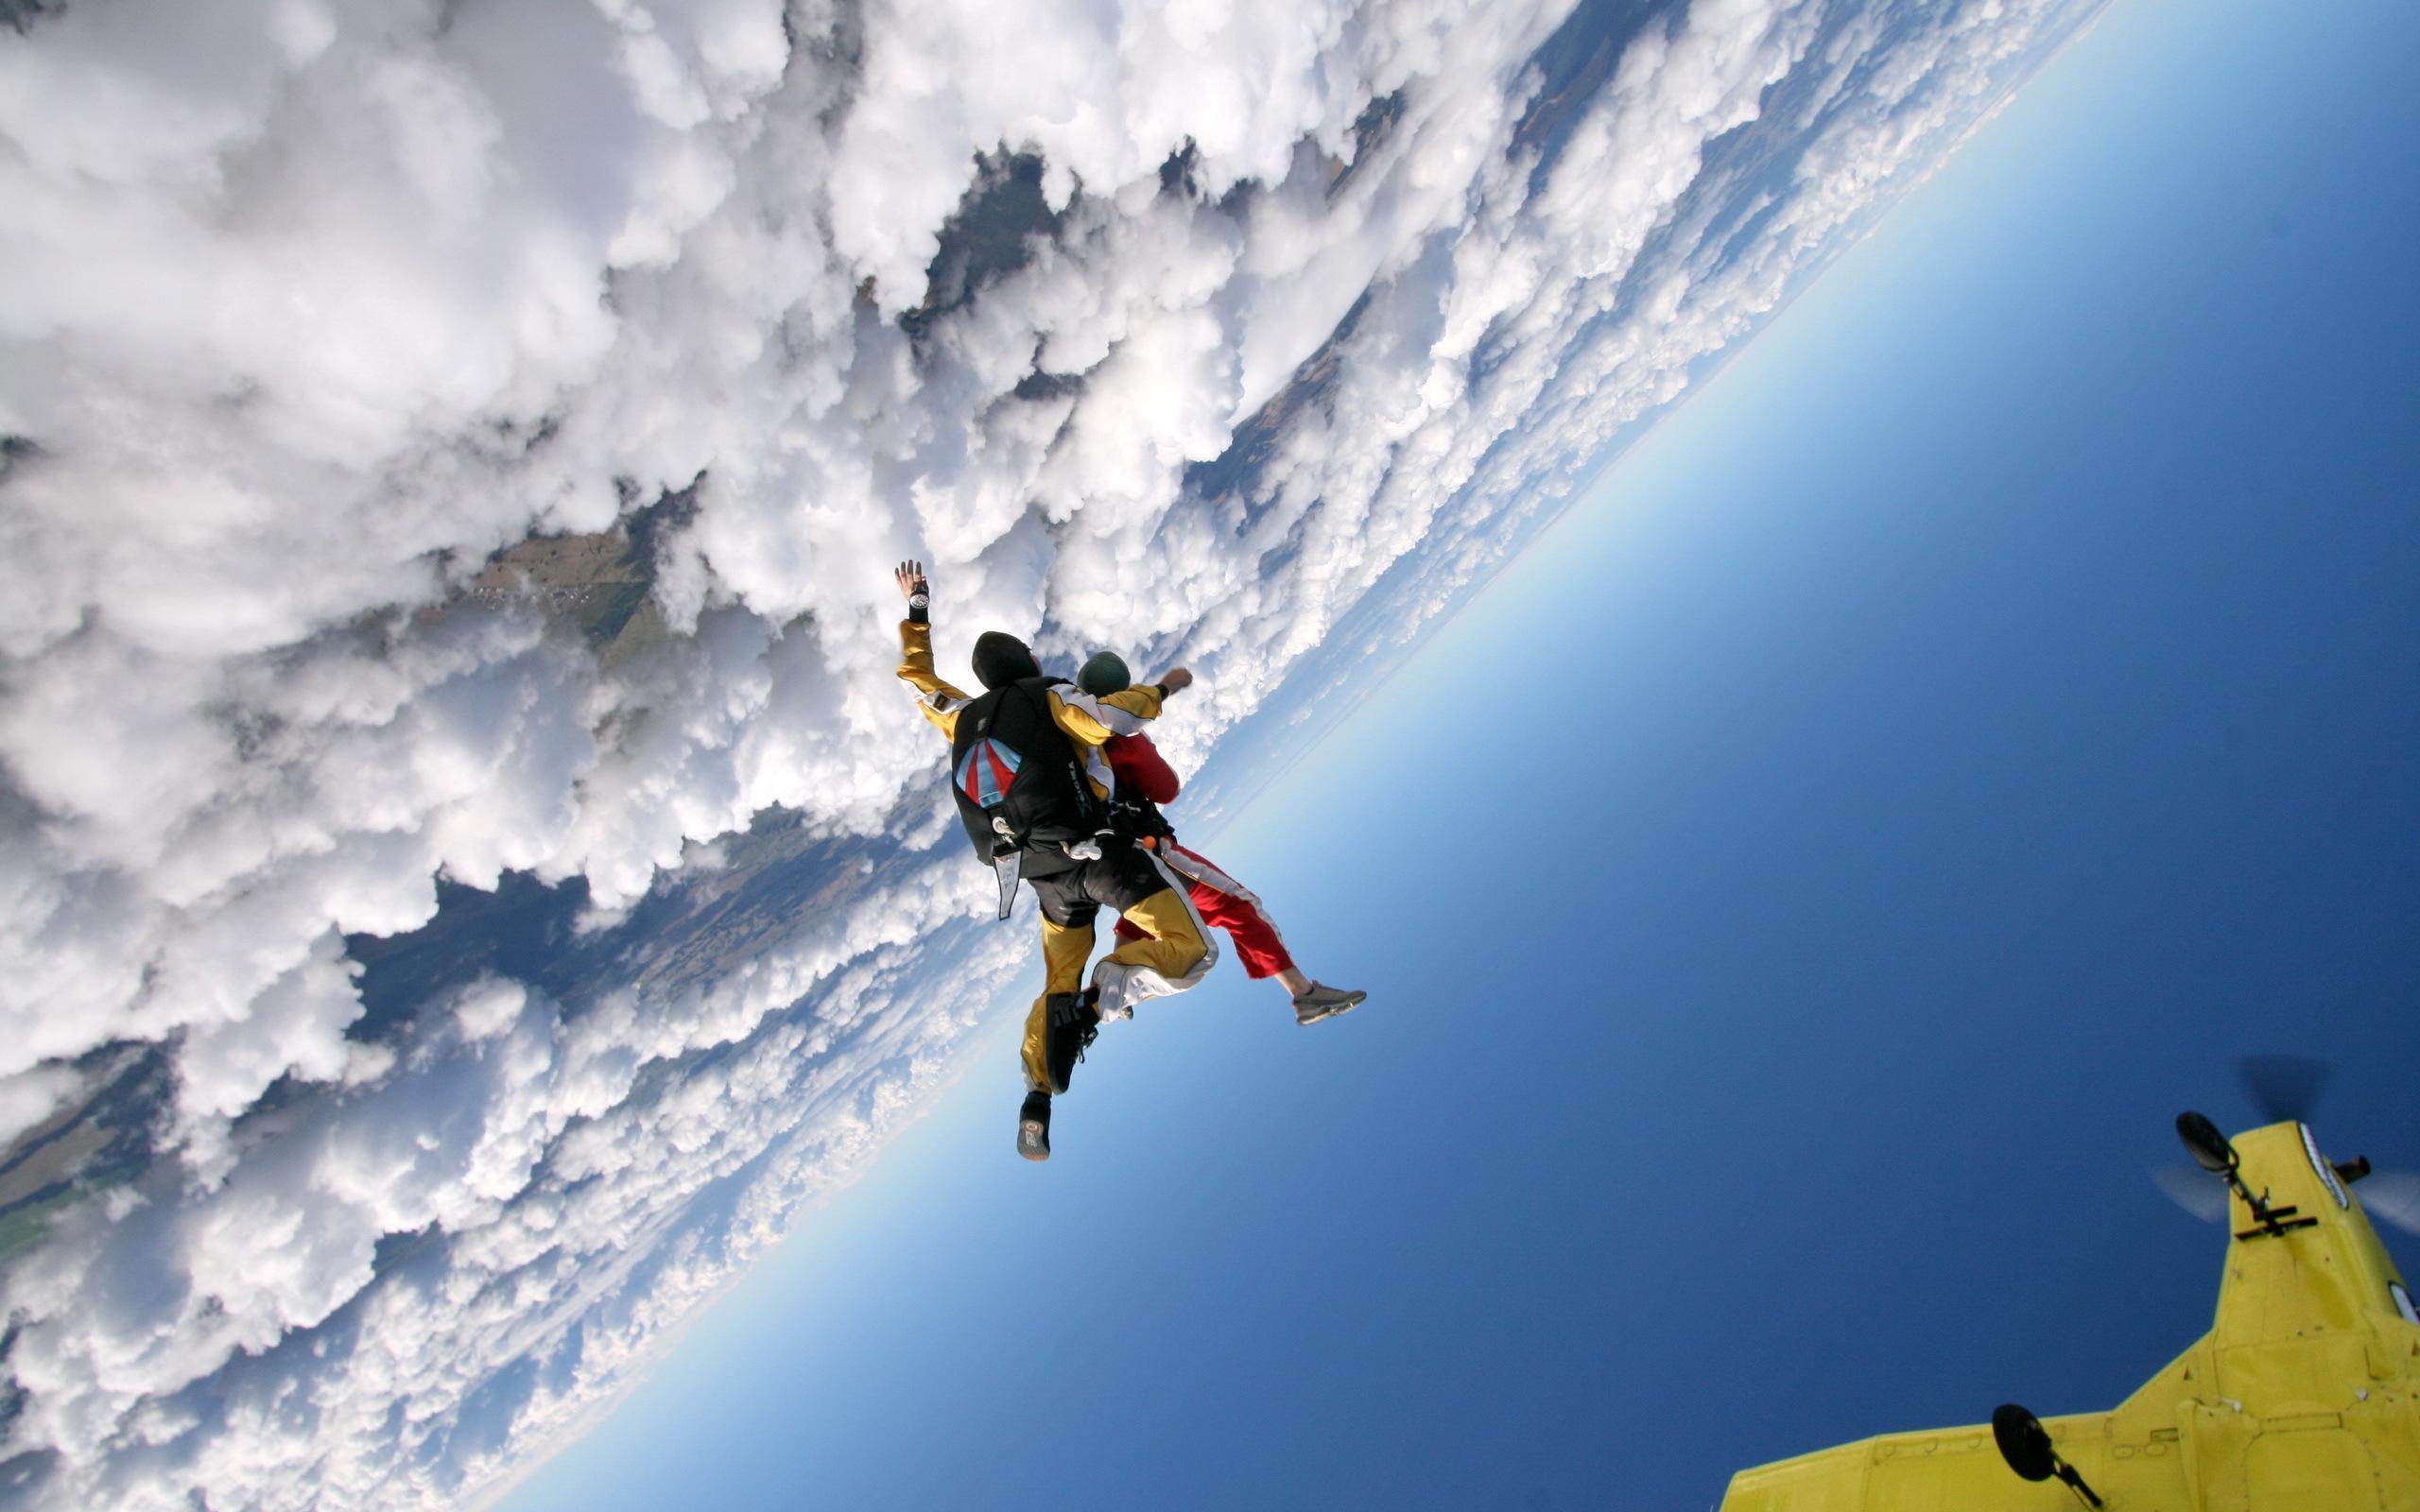 Parachuting wallpapers HD quality